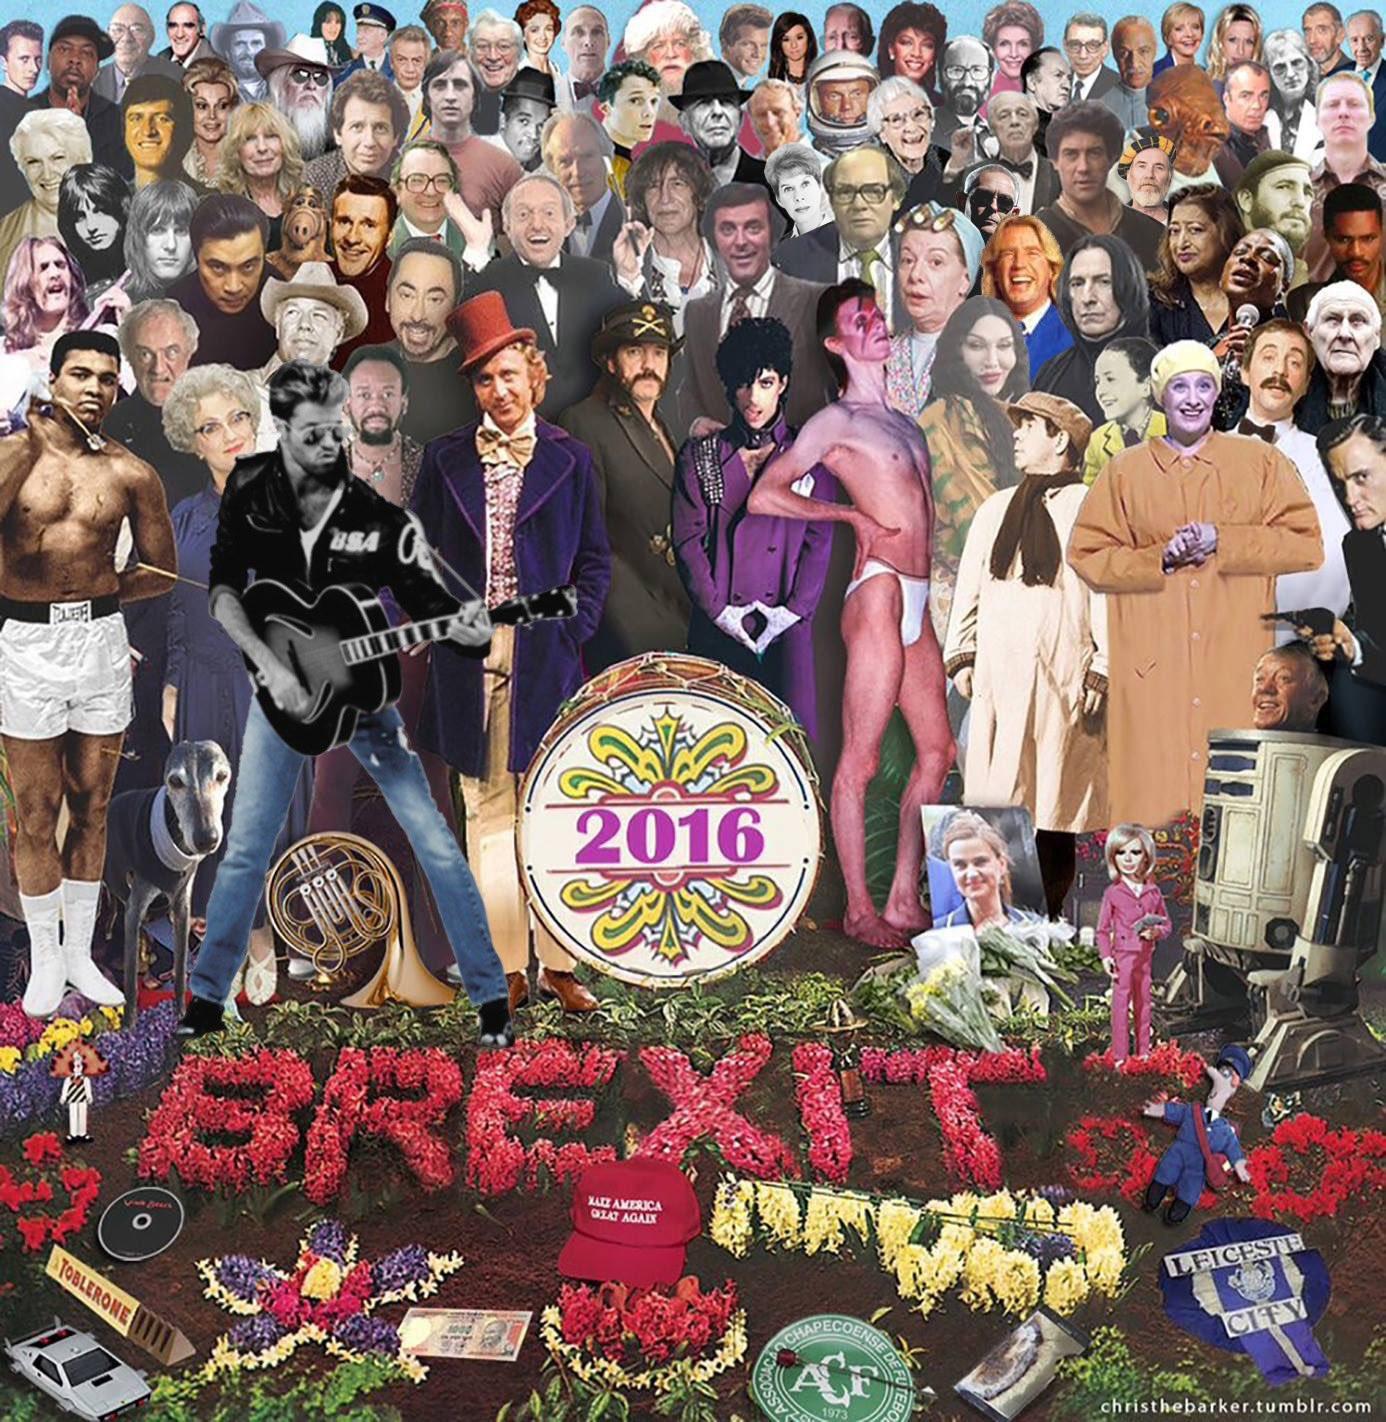 Les artistes morts en 2016 façon Sergeant Pepper